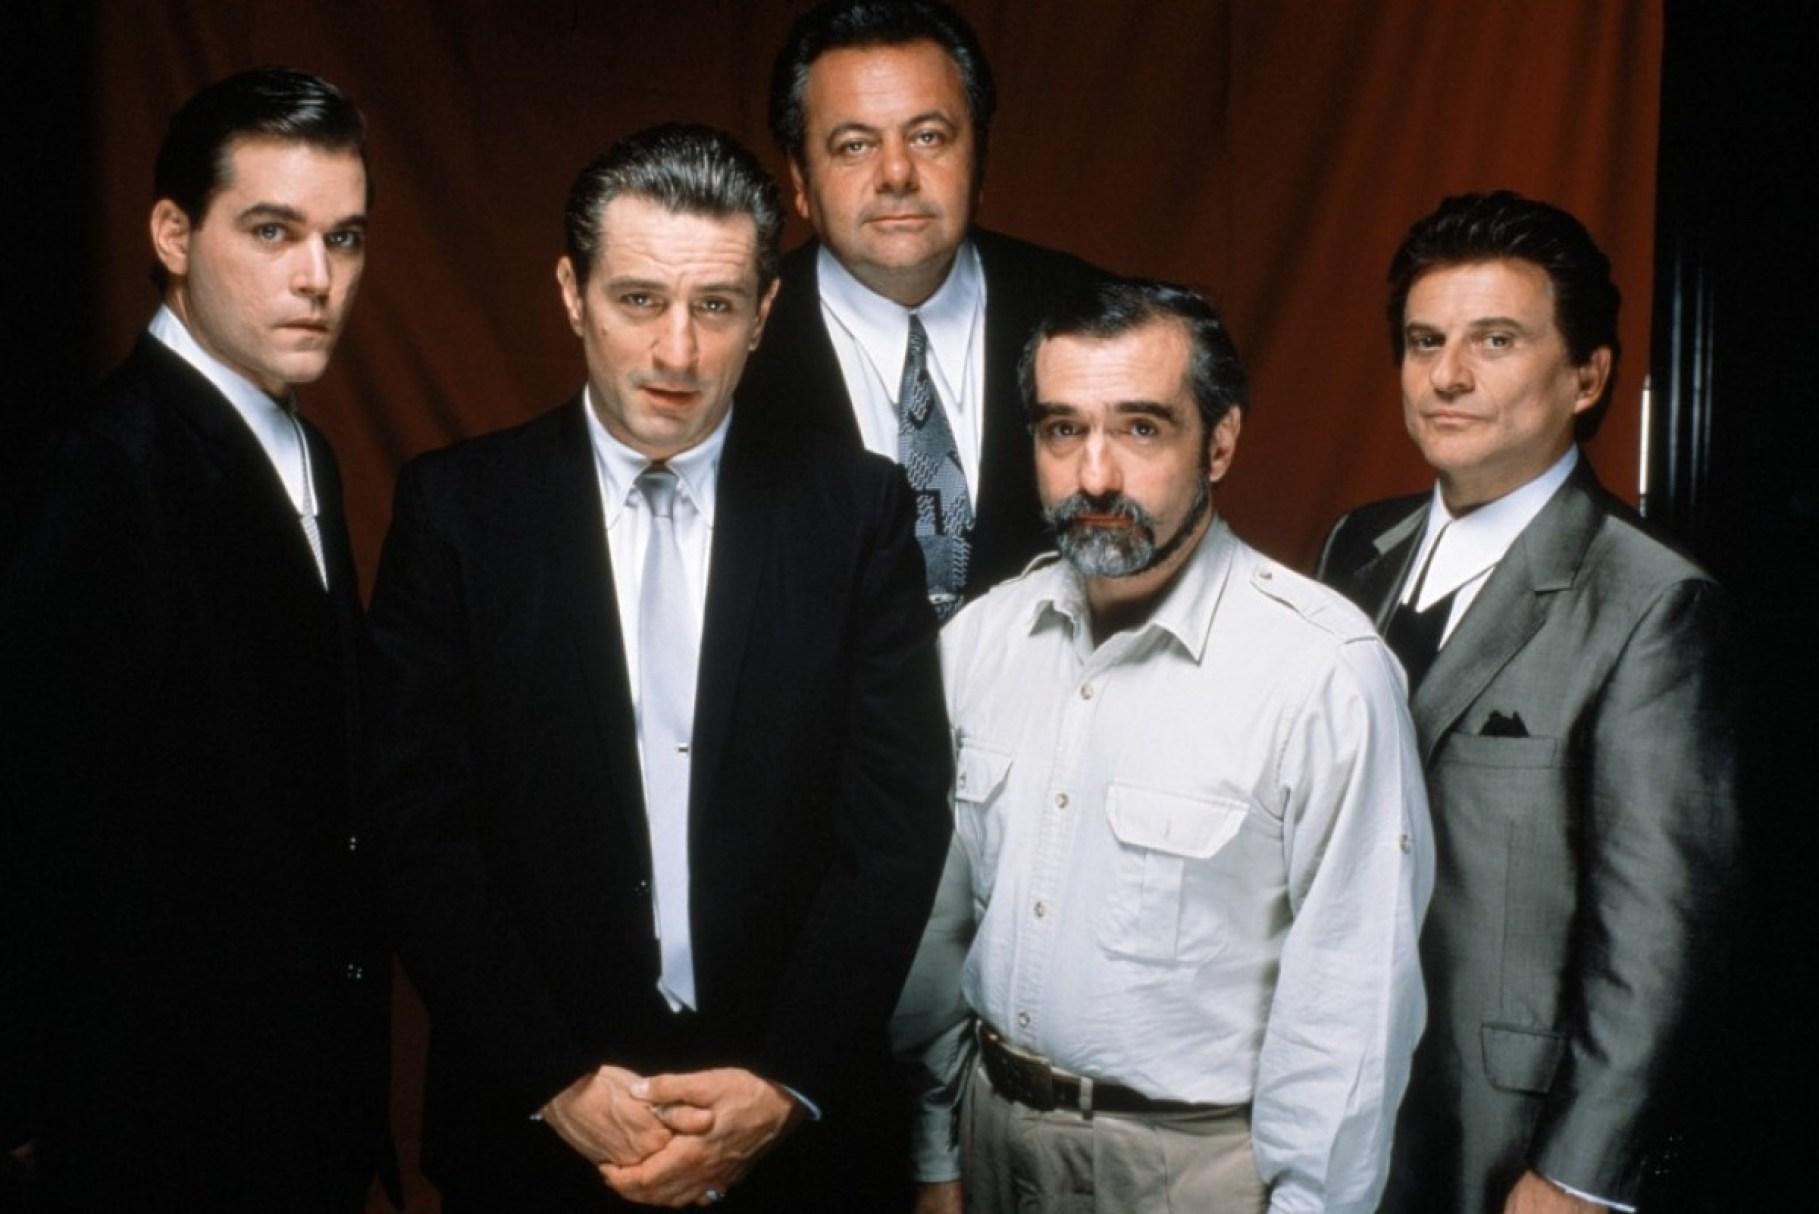 Les affranchis – Martin Scorsese